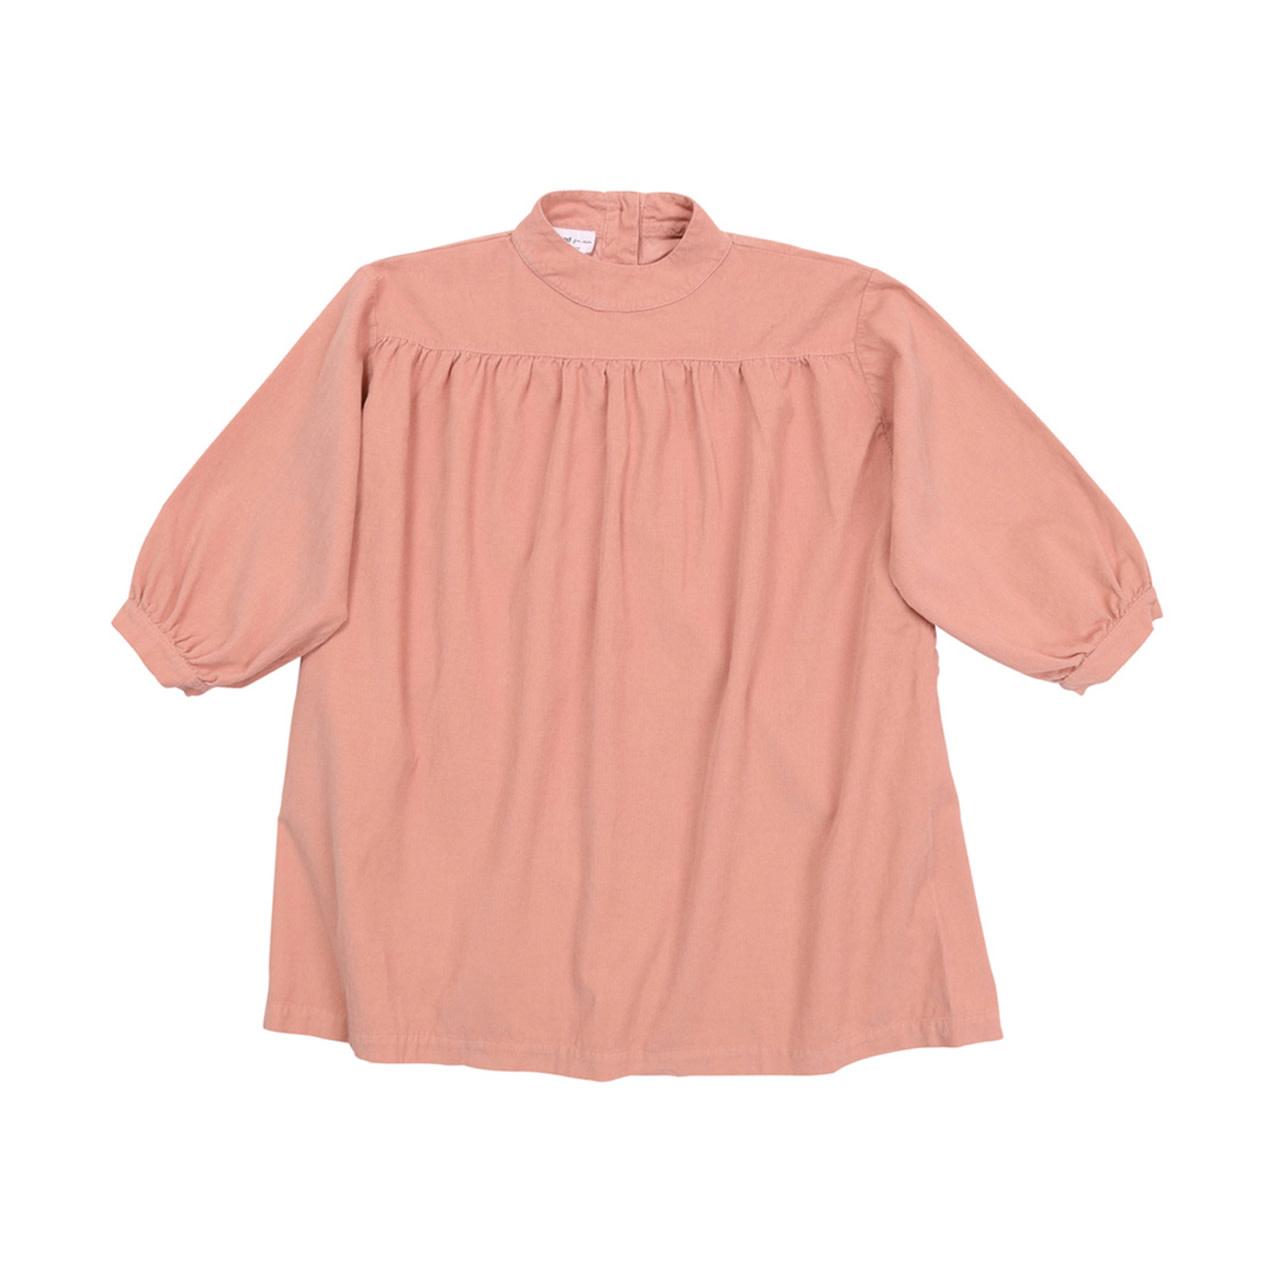 Maed For mini Maed for mini - Dress rosy rabbit